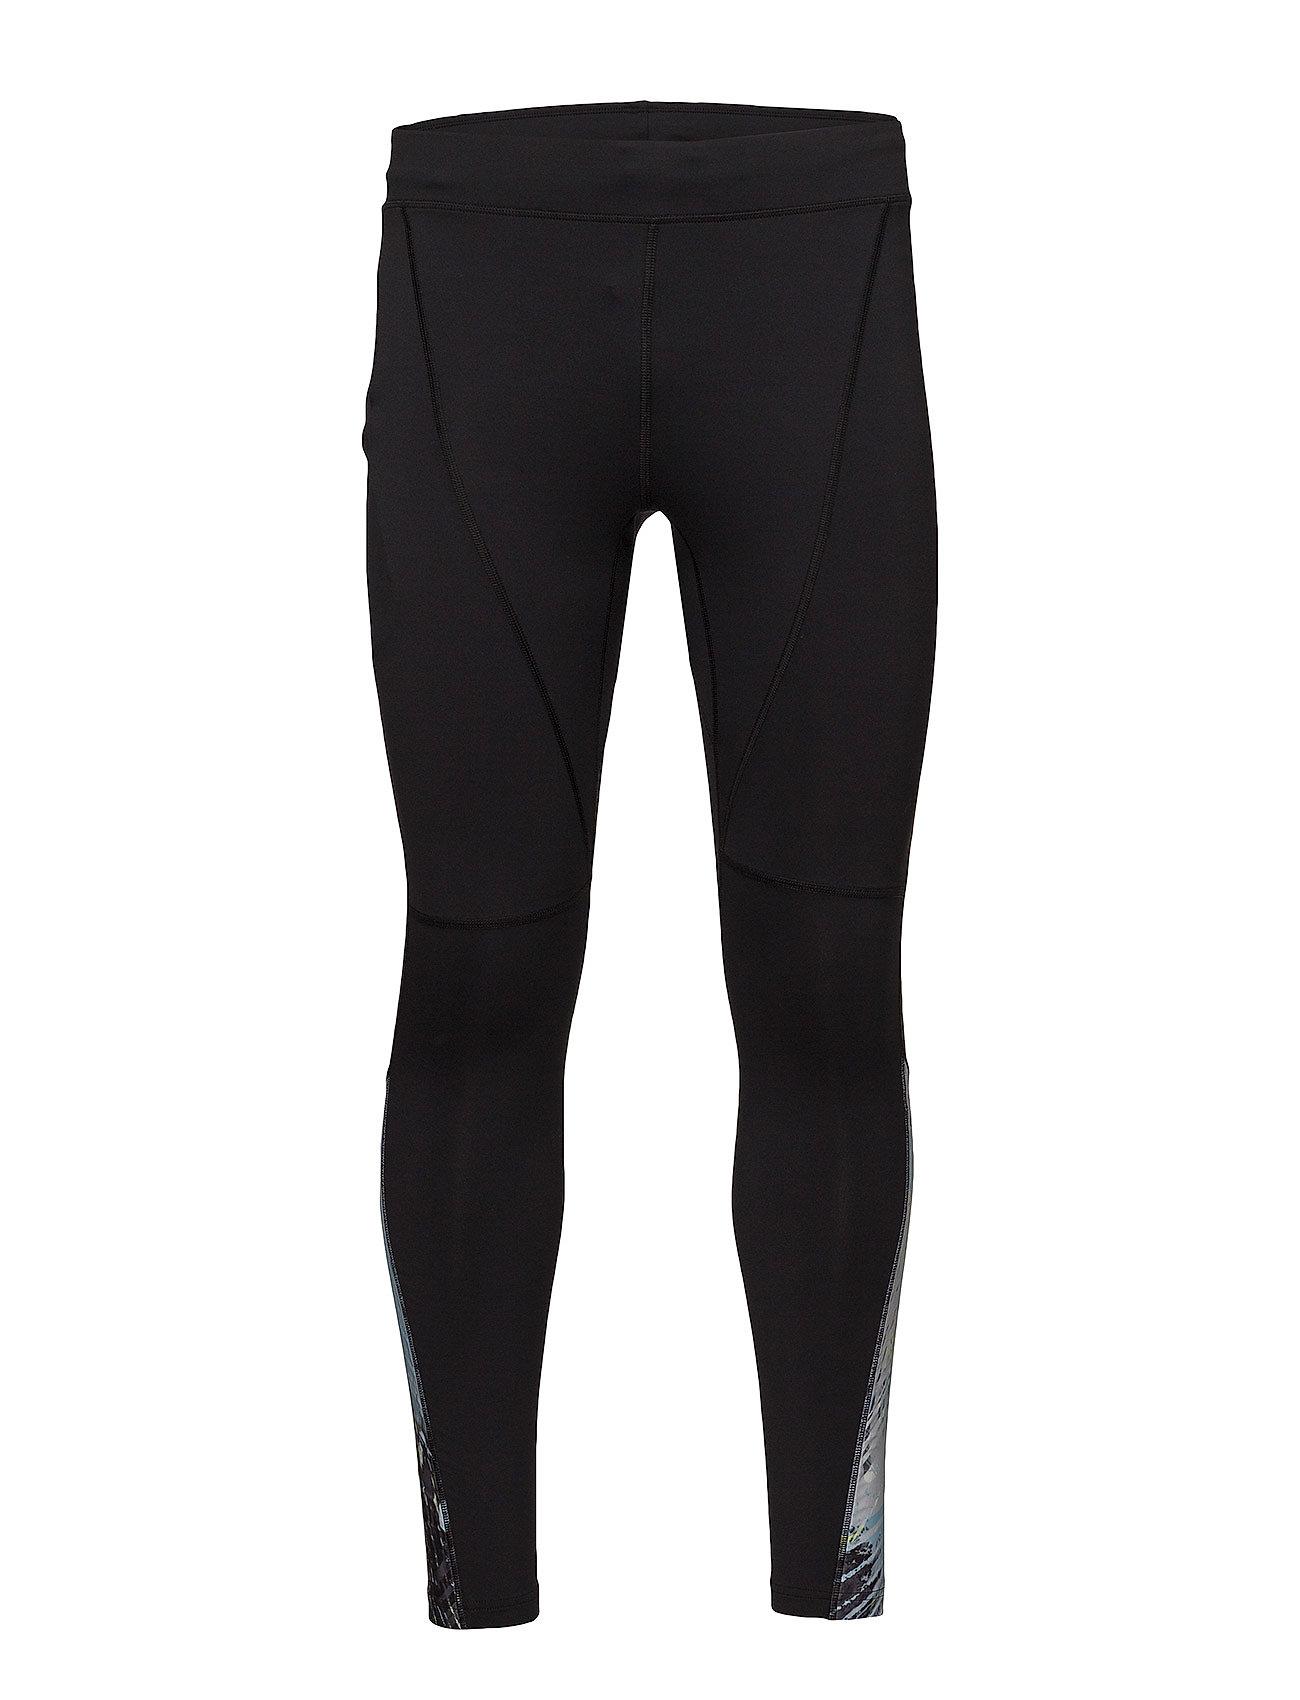 Peak Performance BLOCKPR T Tights & shorts